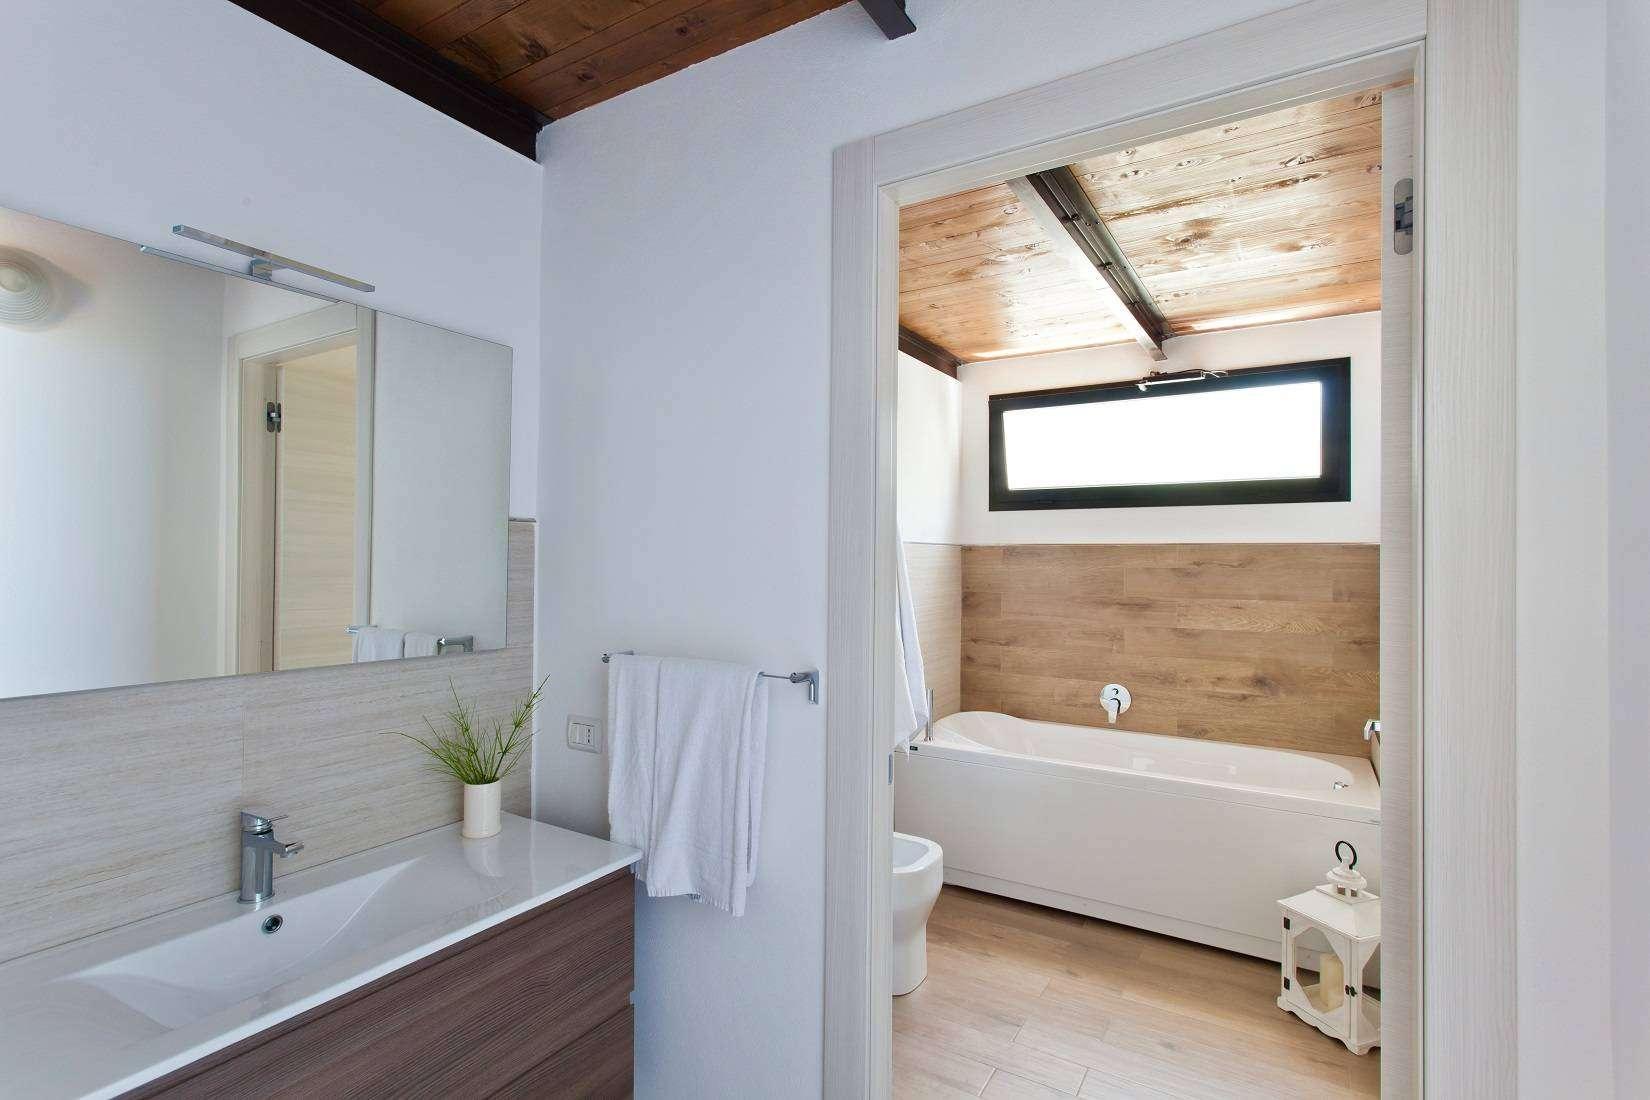 16 Infinity En-suite Bathroom